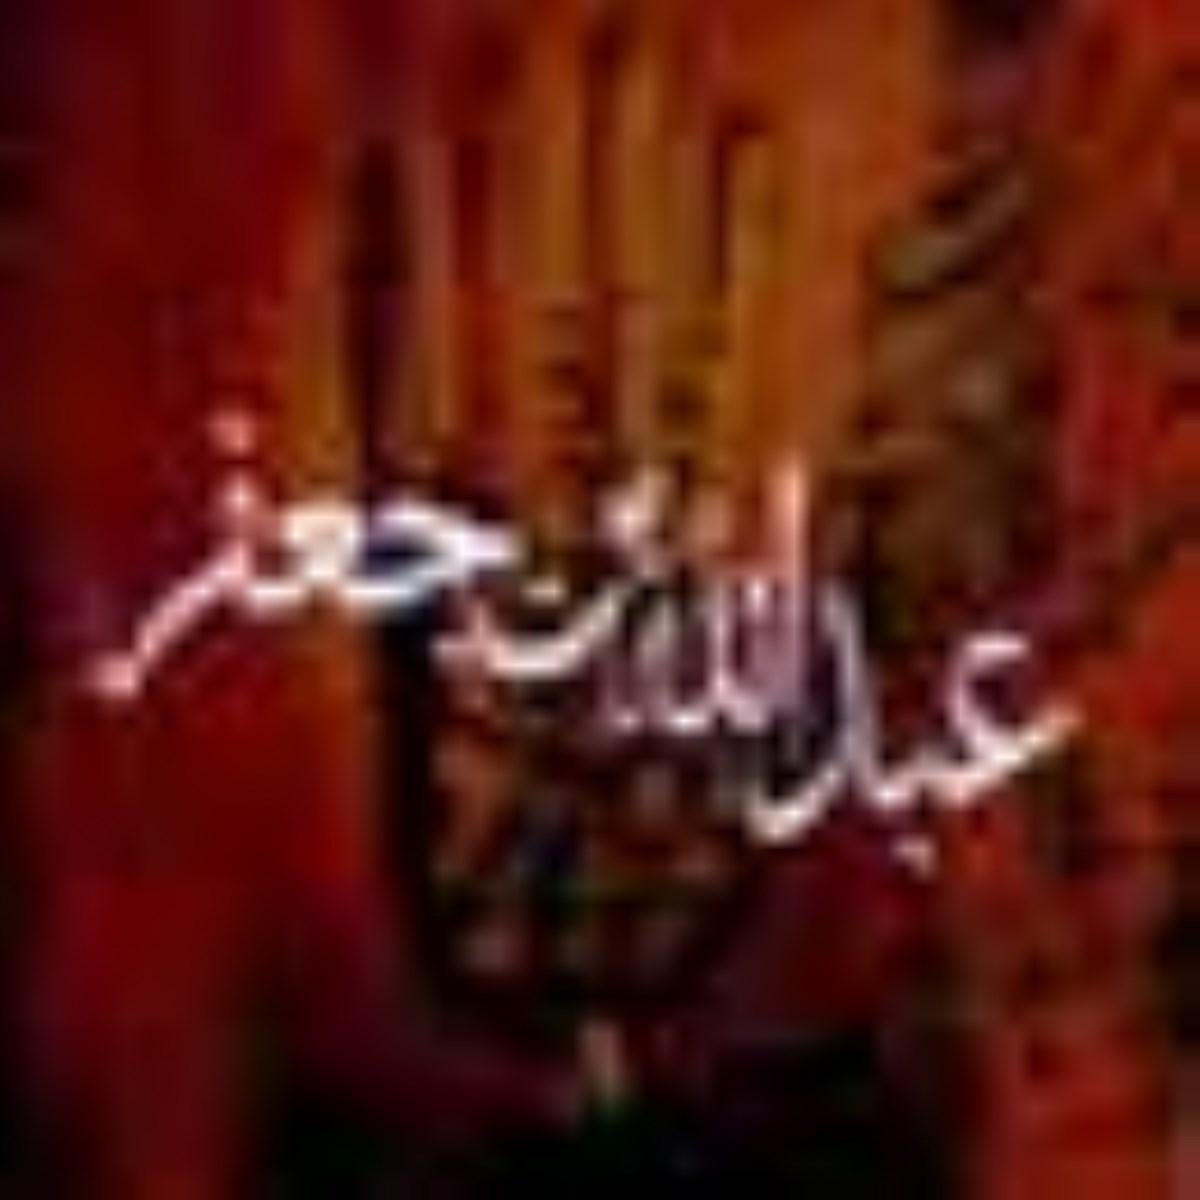 عبدالله بن جعفر طیار همسر زینب (س)